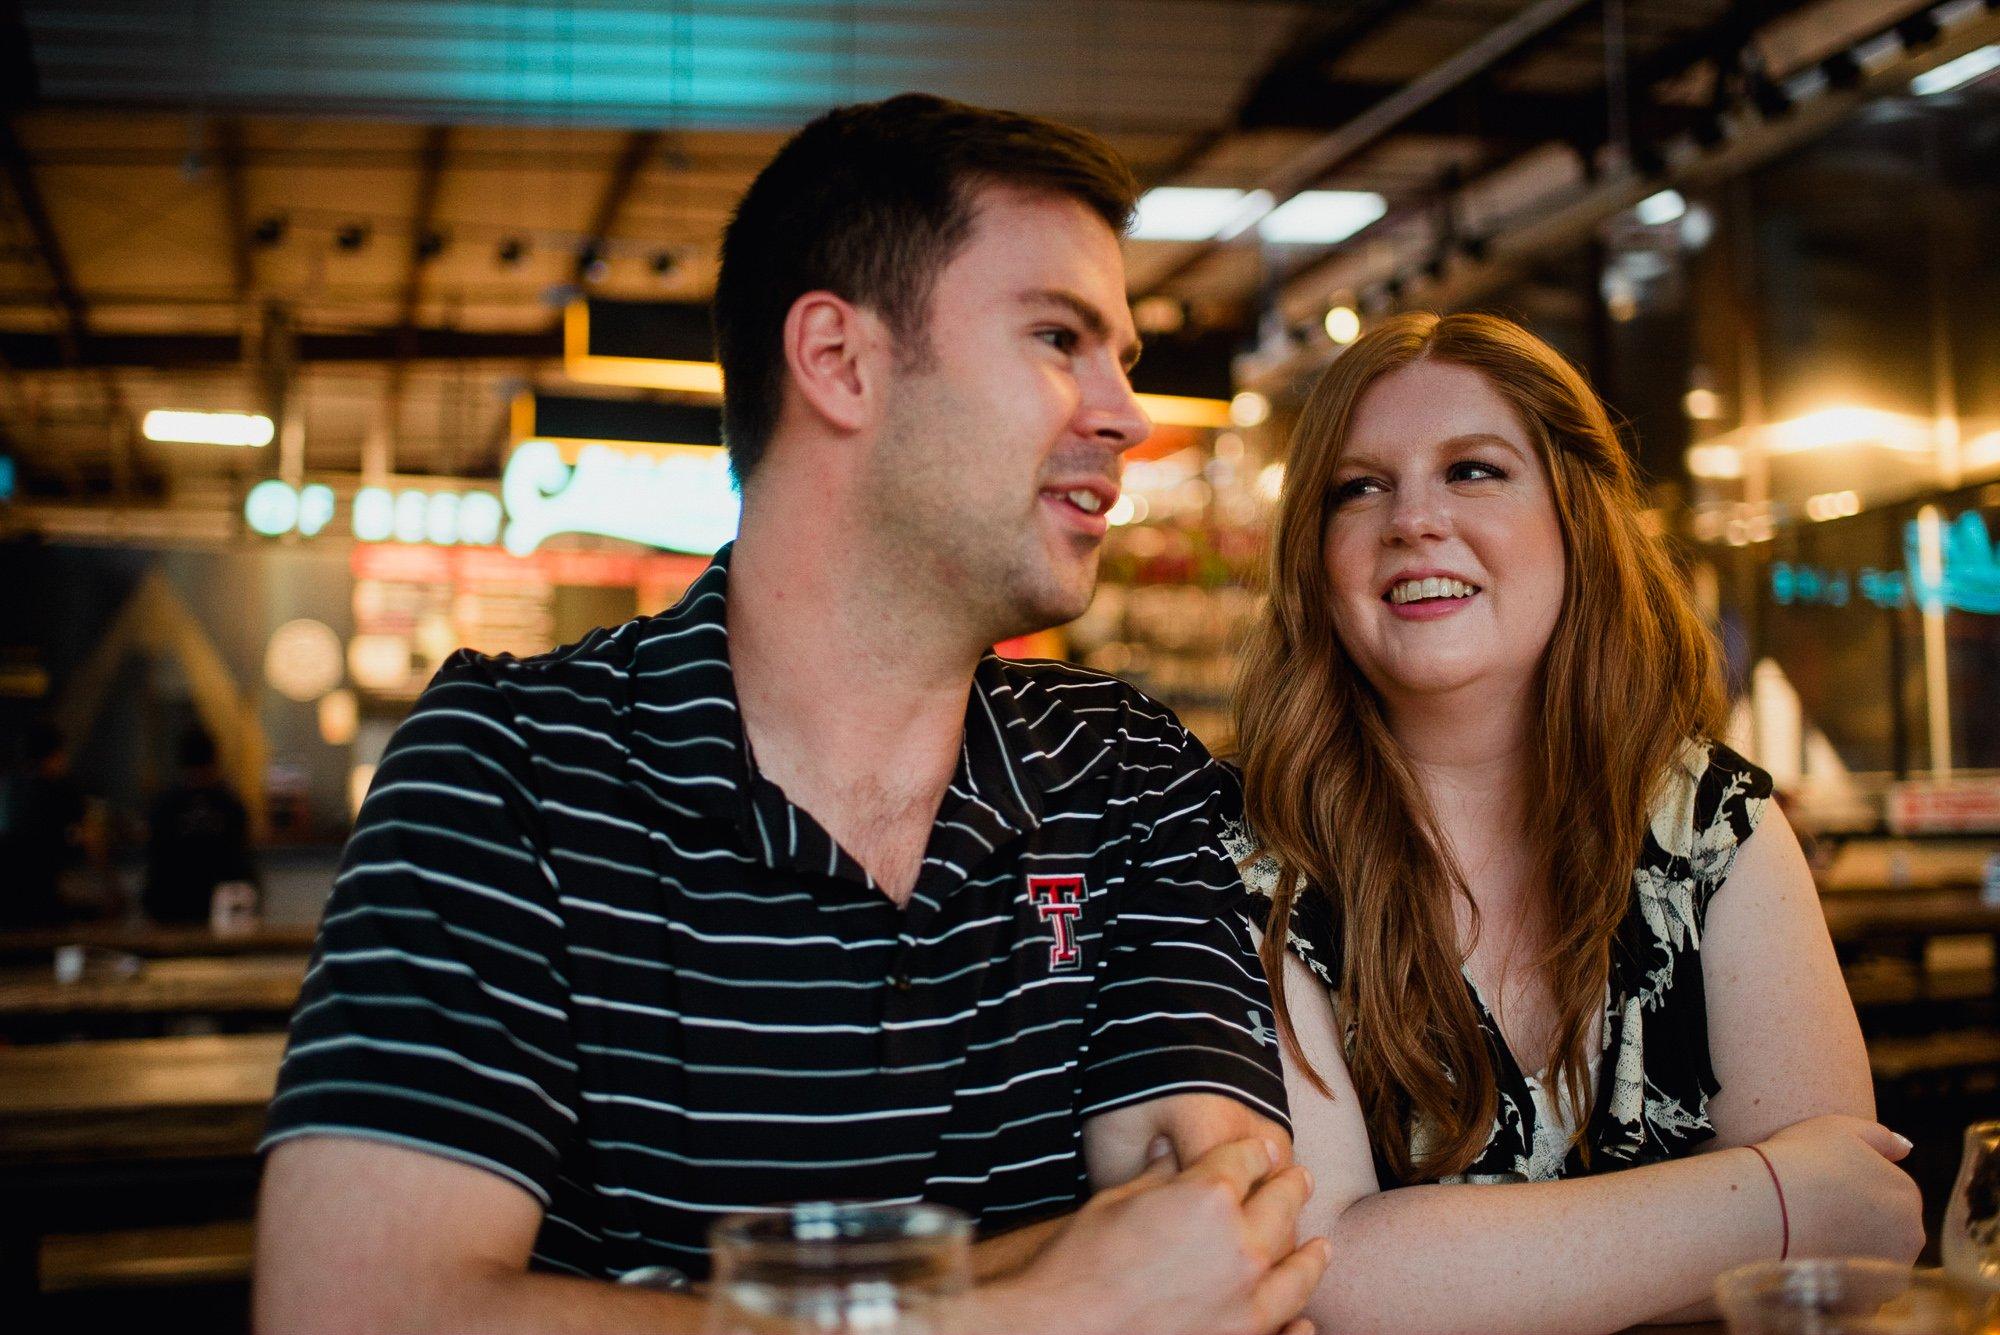 austin beer works engagement photos, austin brewery engagement photos, craft beer couple, candid engagement photos, couples session at a brewery in austin texas